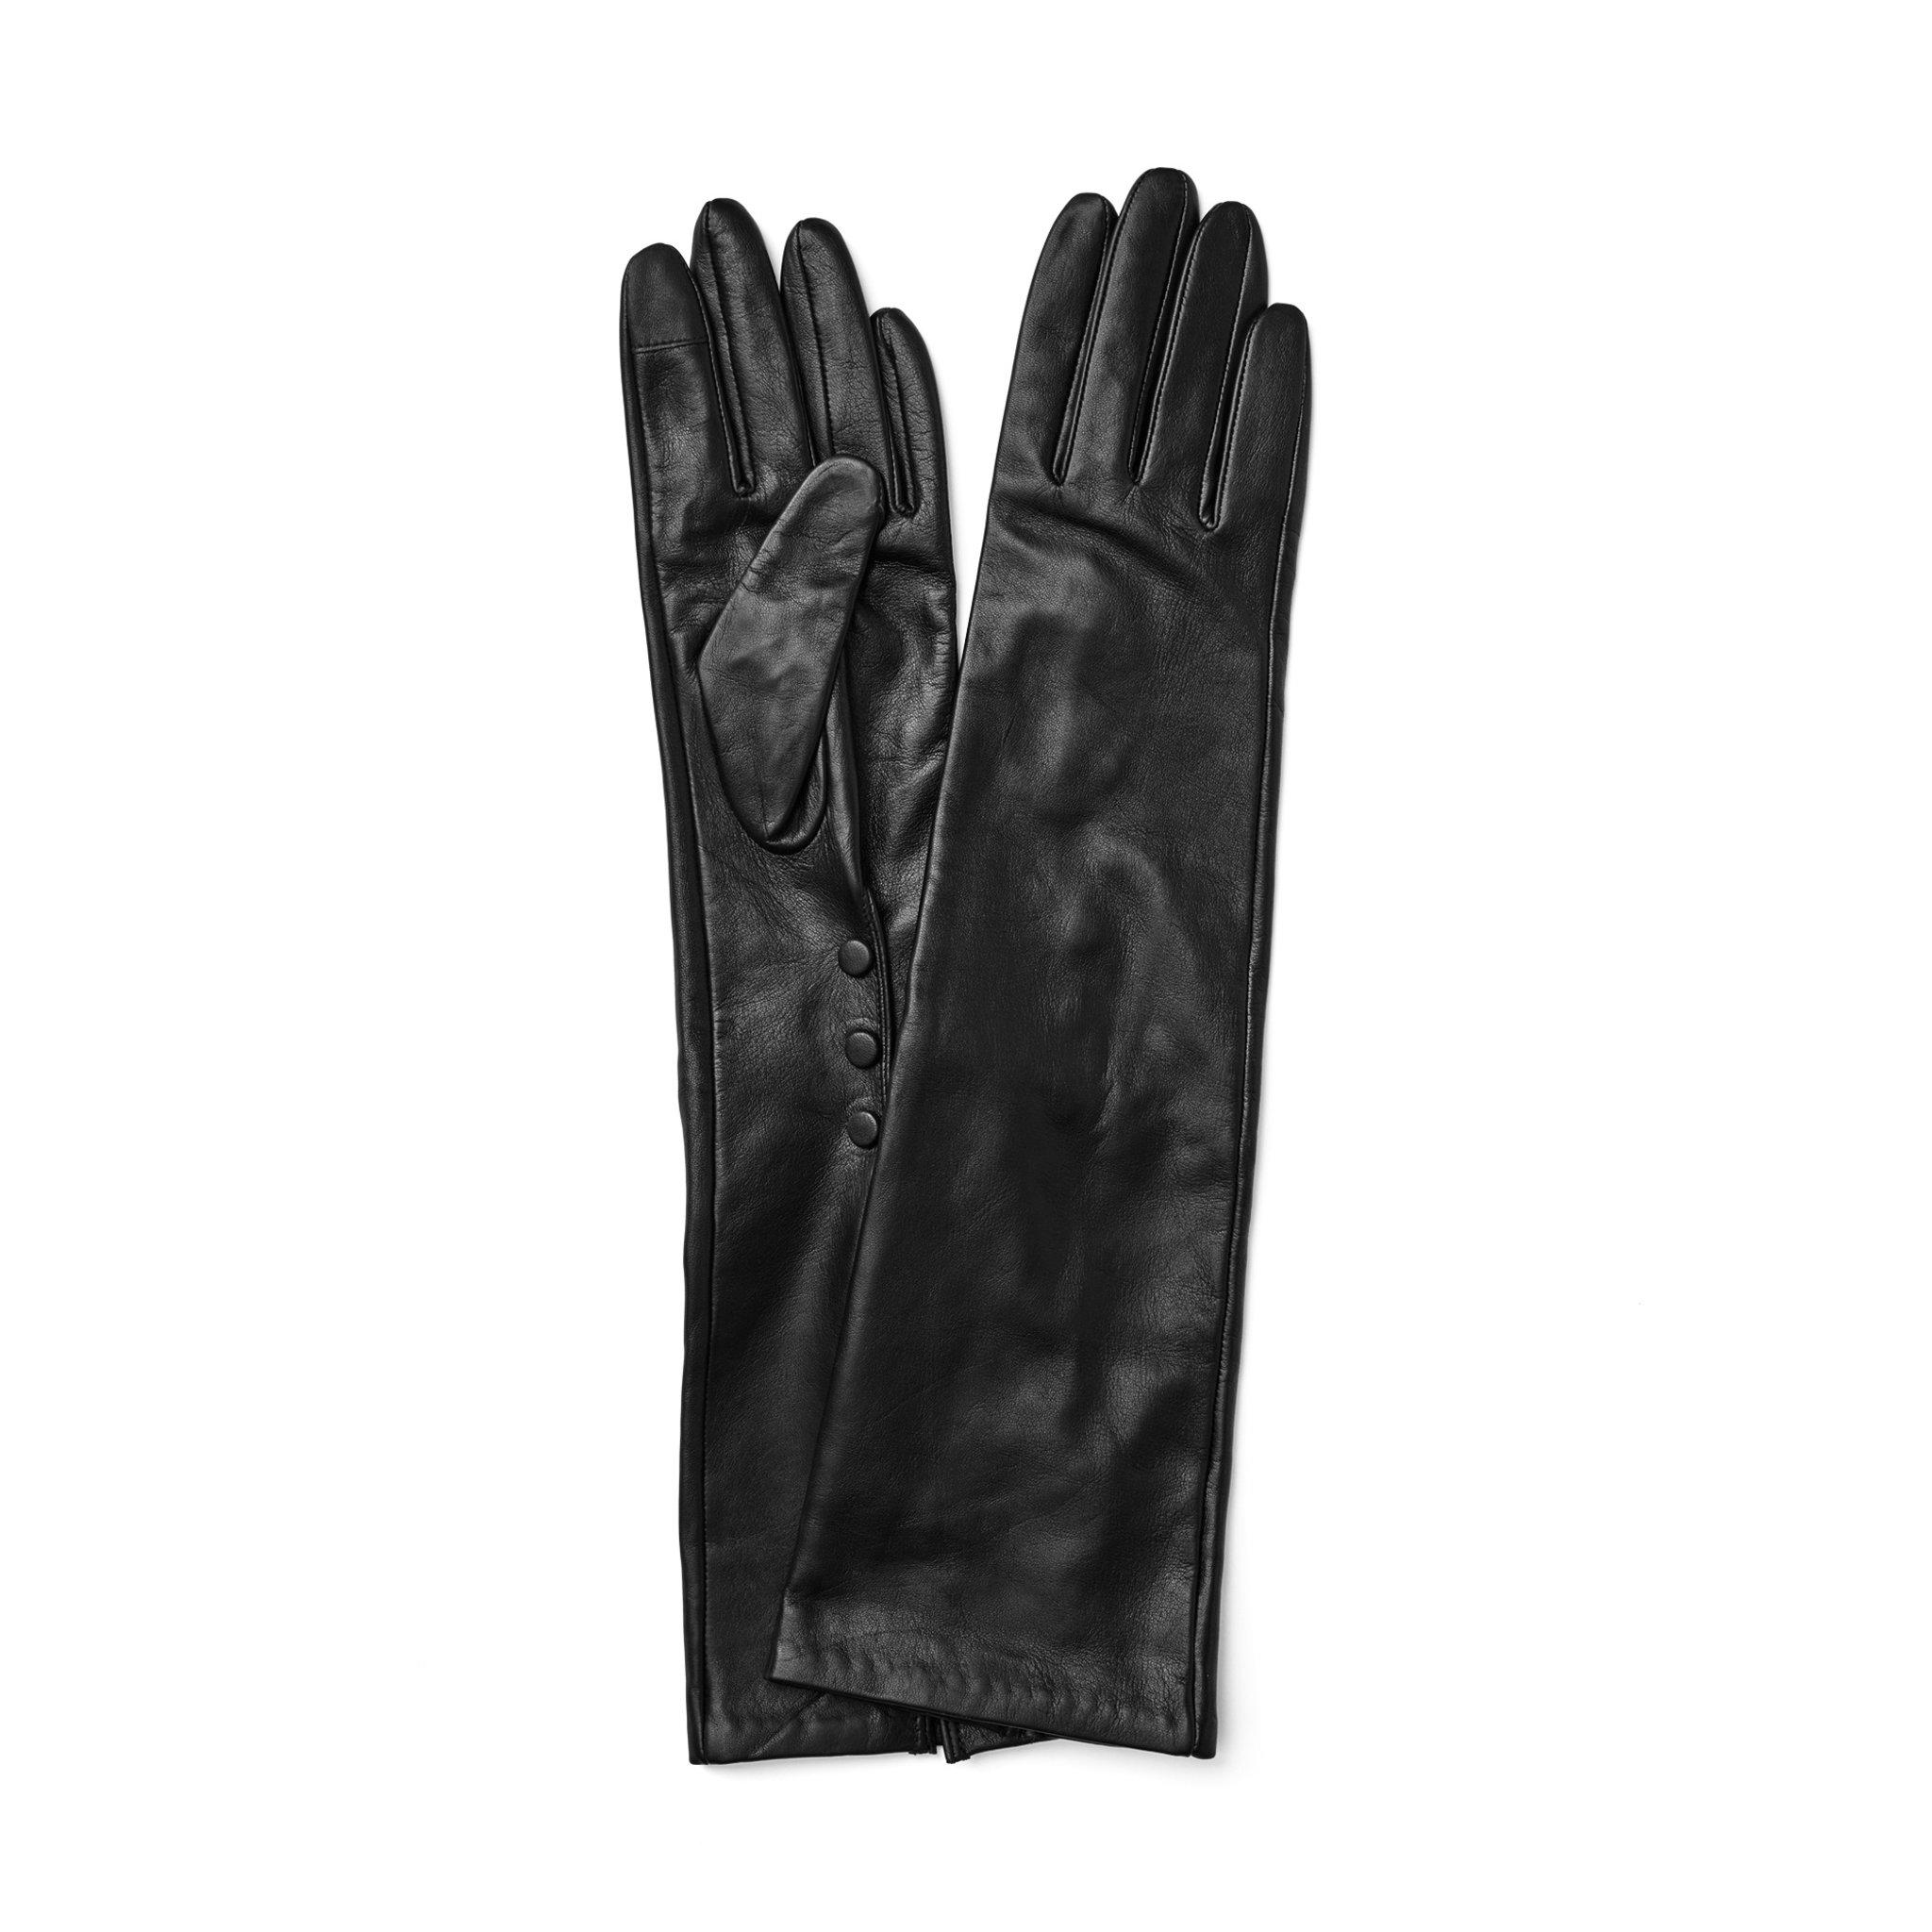 d4b88956a0ed Handskar i skinn - Vantar & handskar - Köp online på åhlens.se!